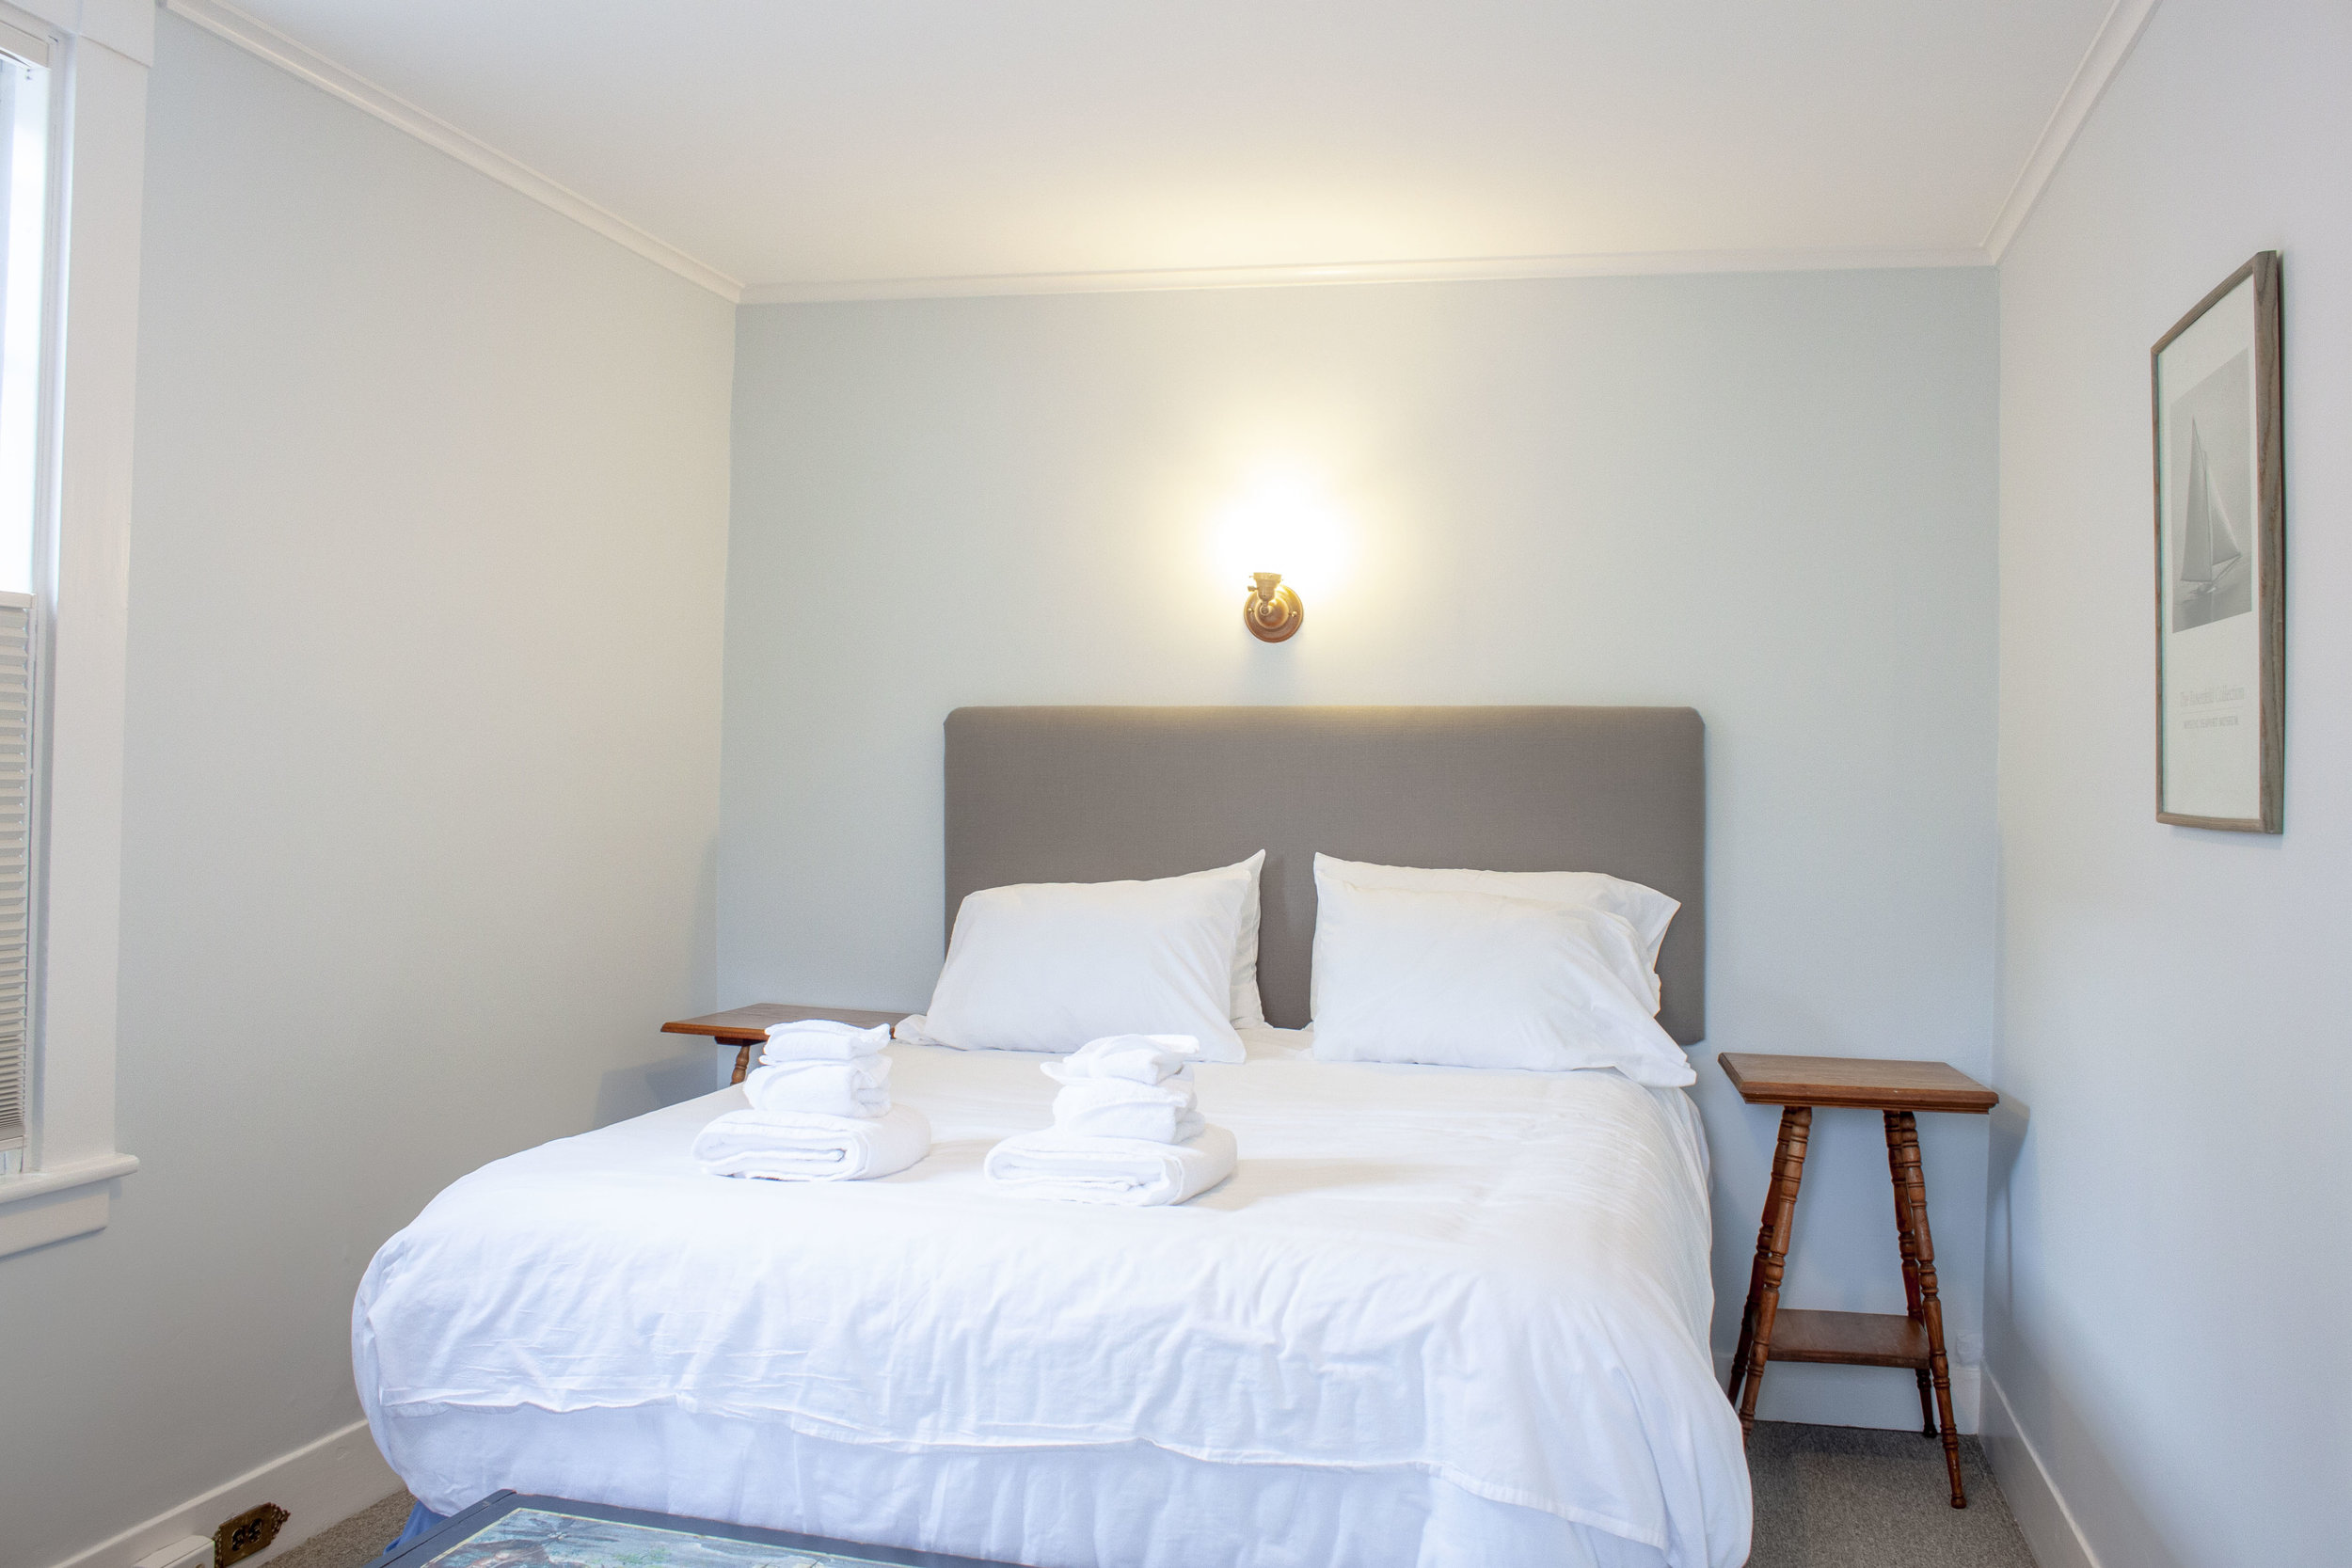 HH_Room5.jpg